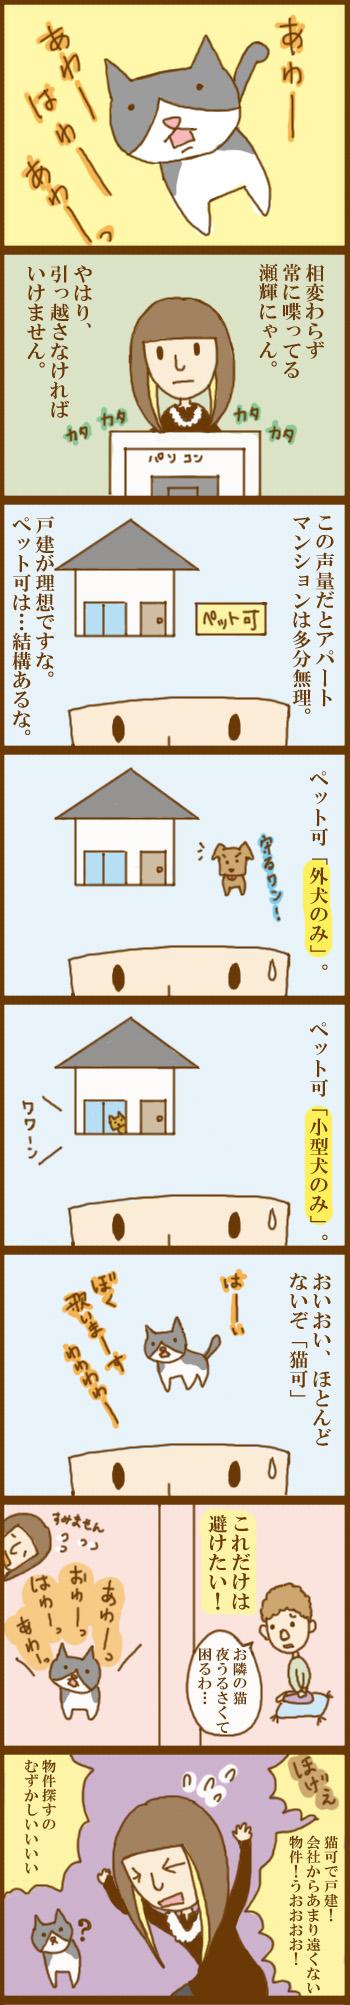 f:id:suzuokayu:20201017223343j:plain